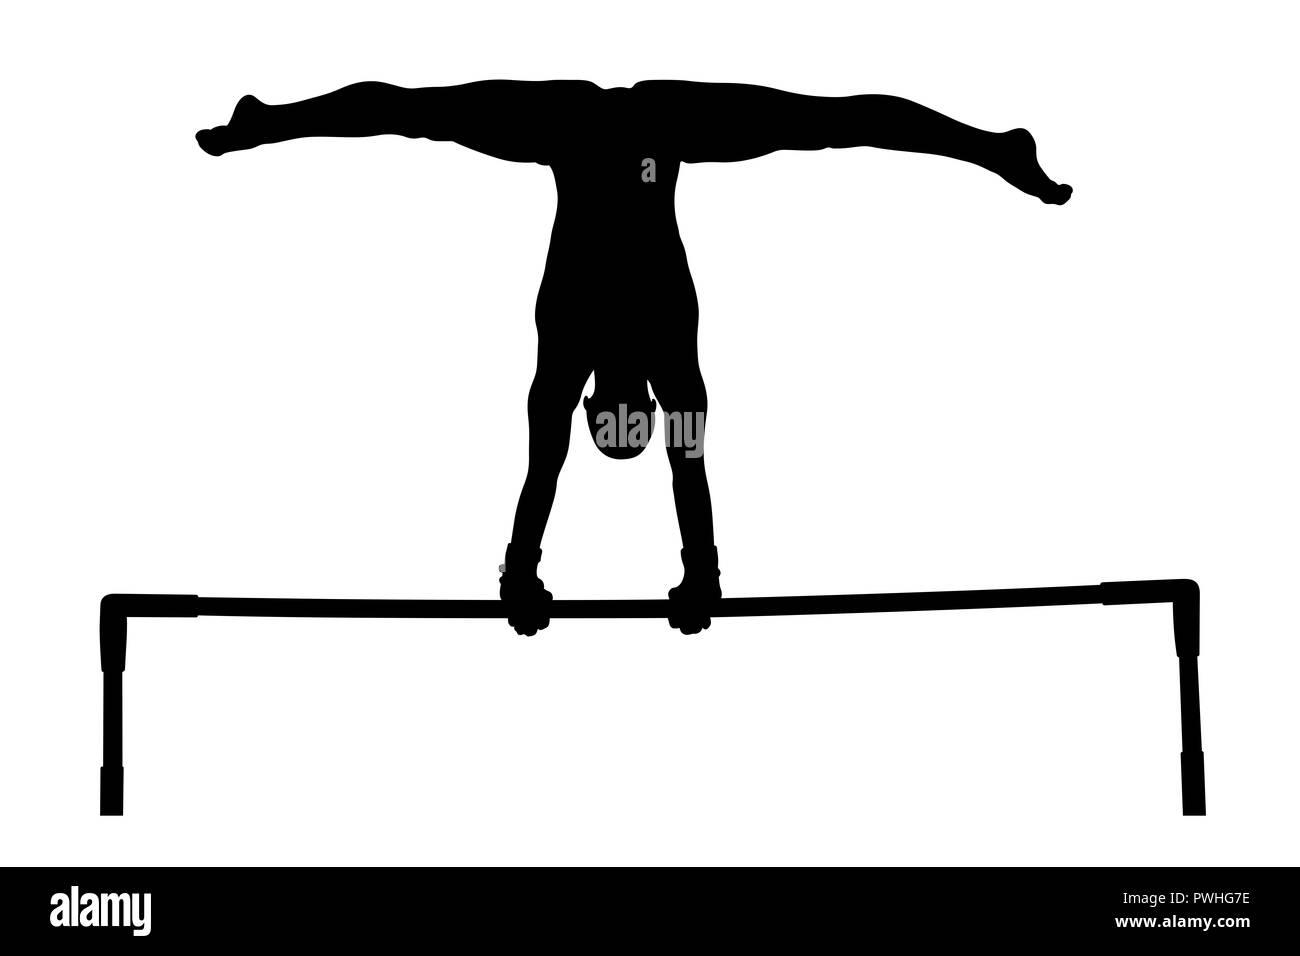 cd6de5e991de Ejercicio barras paralelas mujer gimnasta silueta negra Imagen De Stock